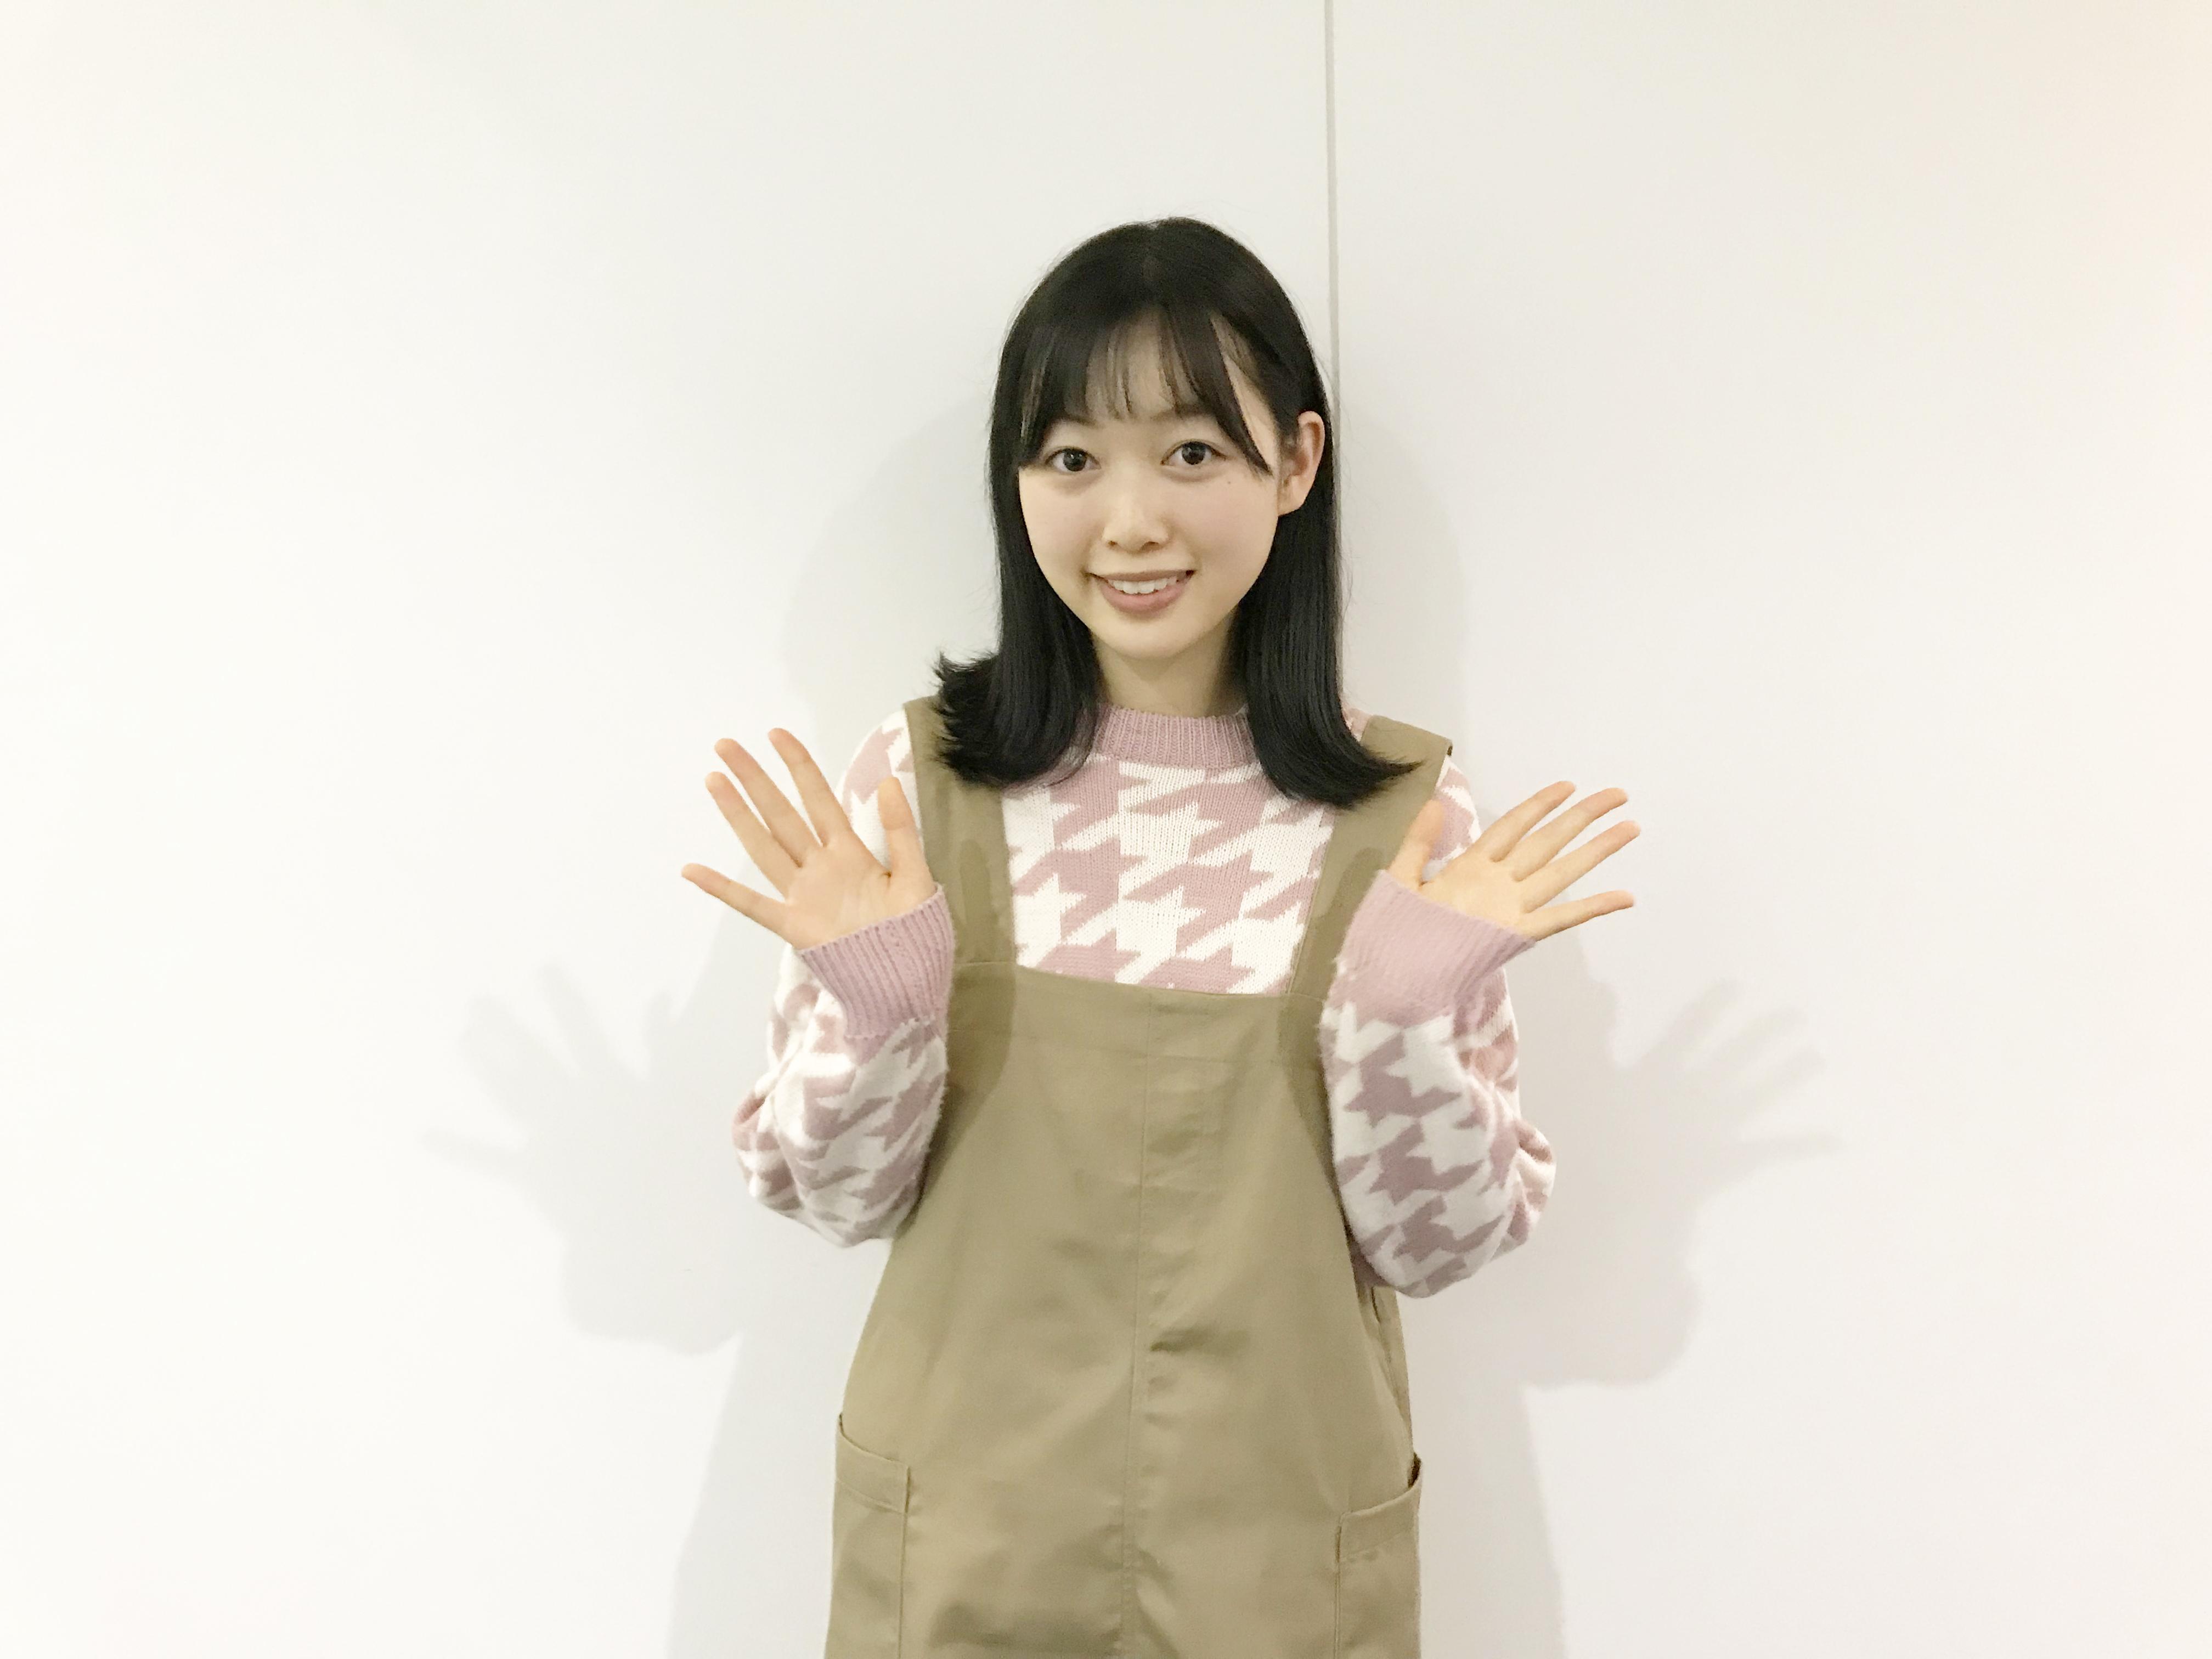 http://www.joqr.co.jp/nogizaka/kitagawa355.jpg